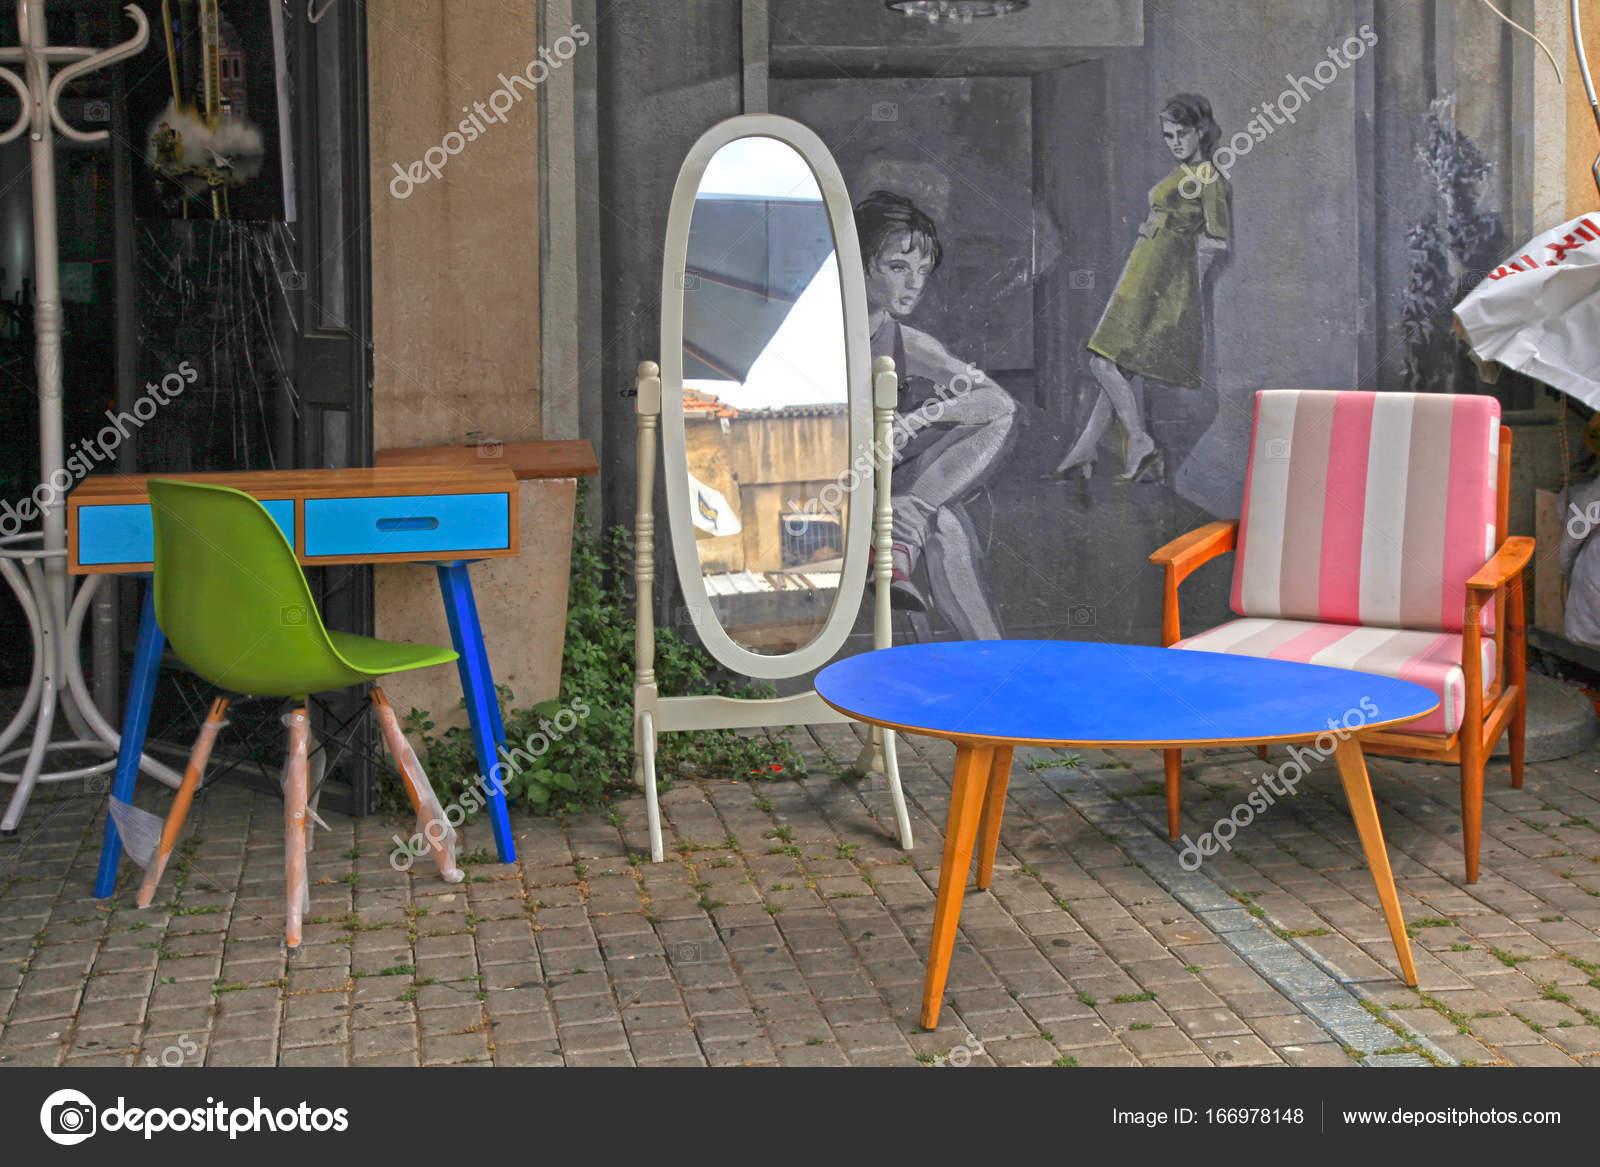 Vintage Furniture And Other Staff At Jaffa Flea Market In Tel Aviv